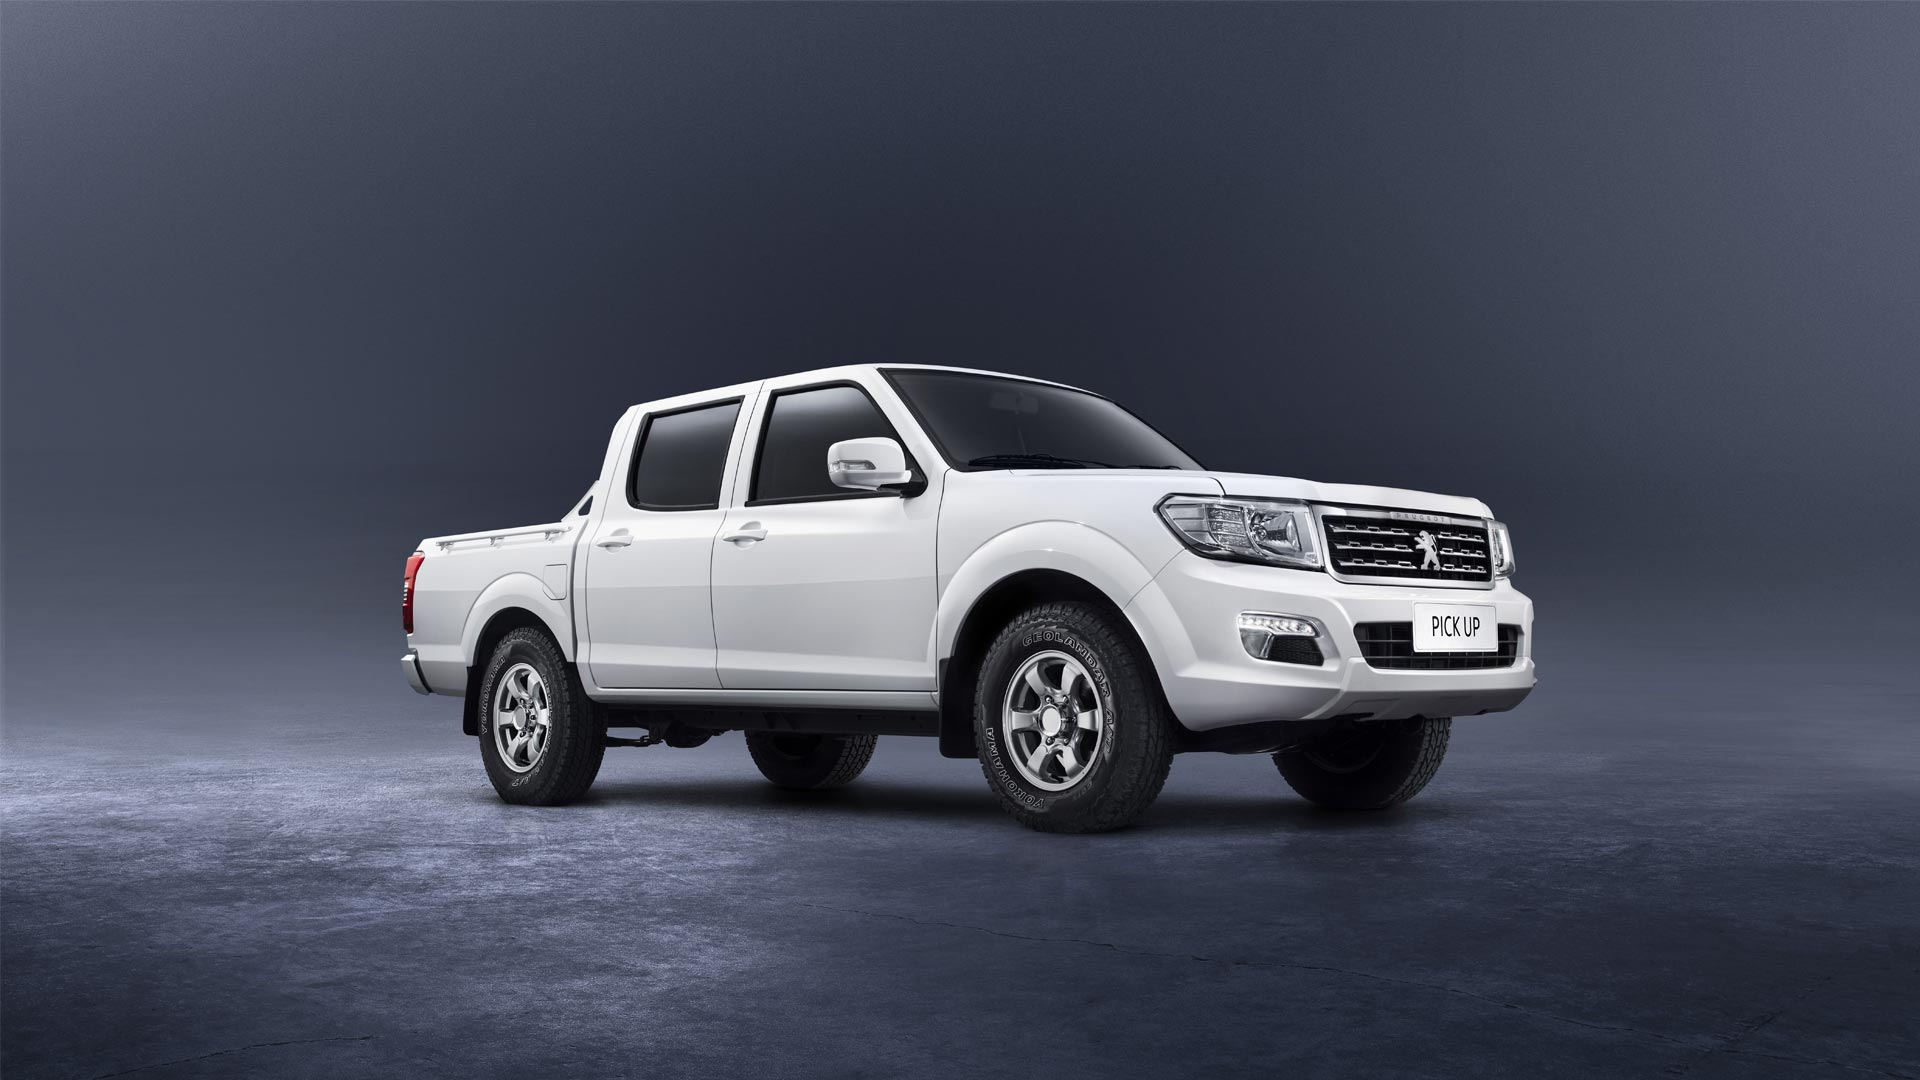 Peugeot-Pick-Up